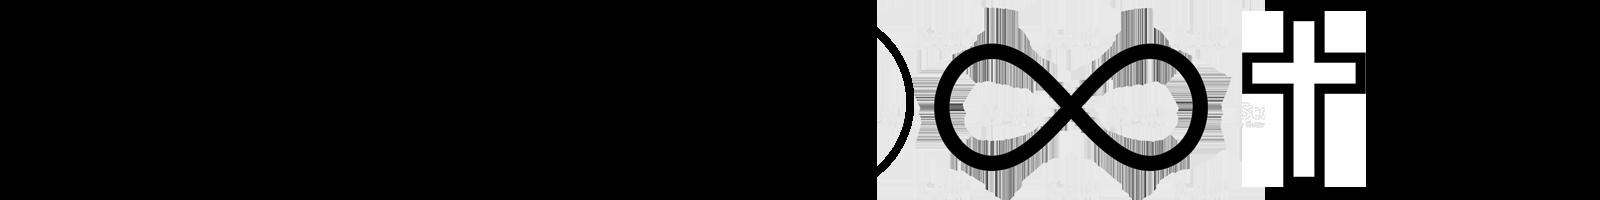 laser-gravur-symbole